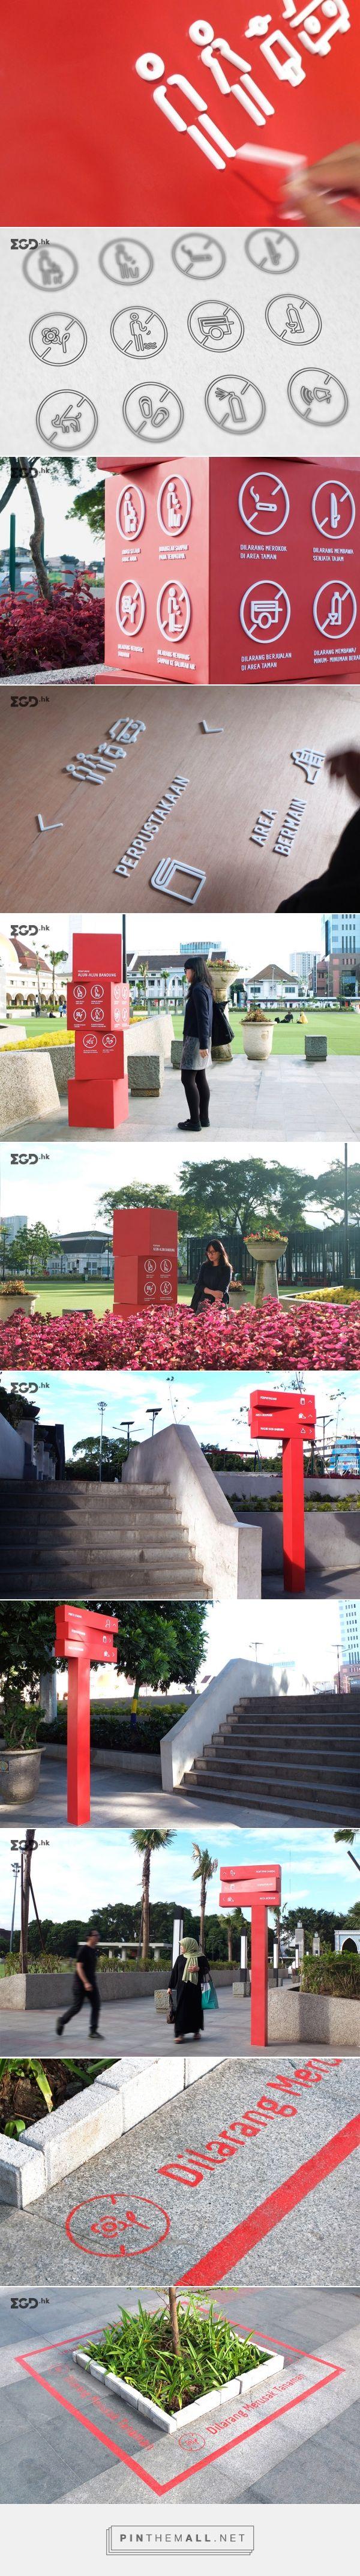 alun-alun bandung导视设计 |  EGD环境图形设计 - created via http://pinthemall.net